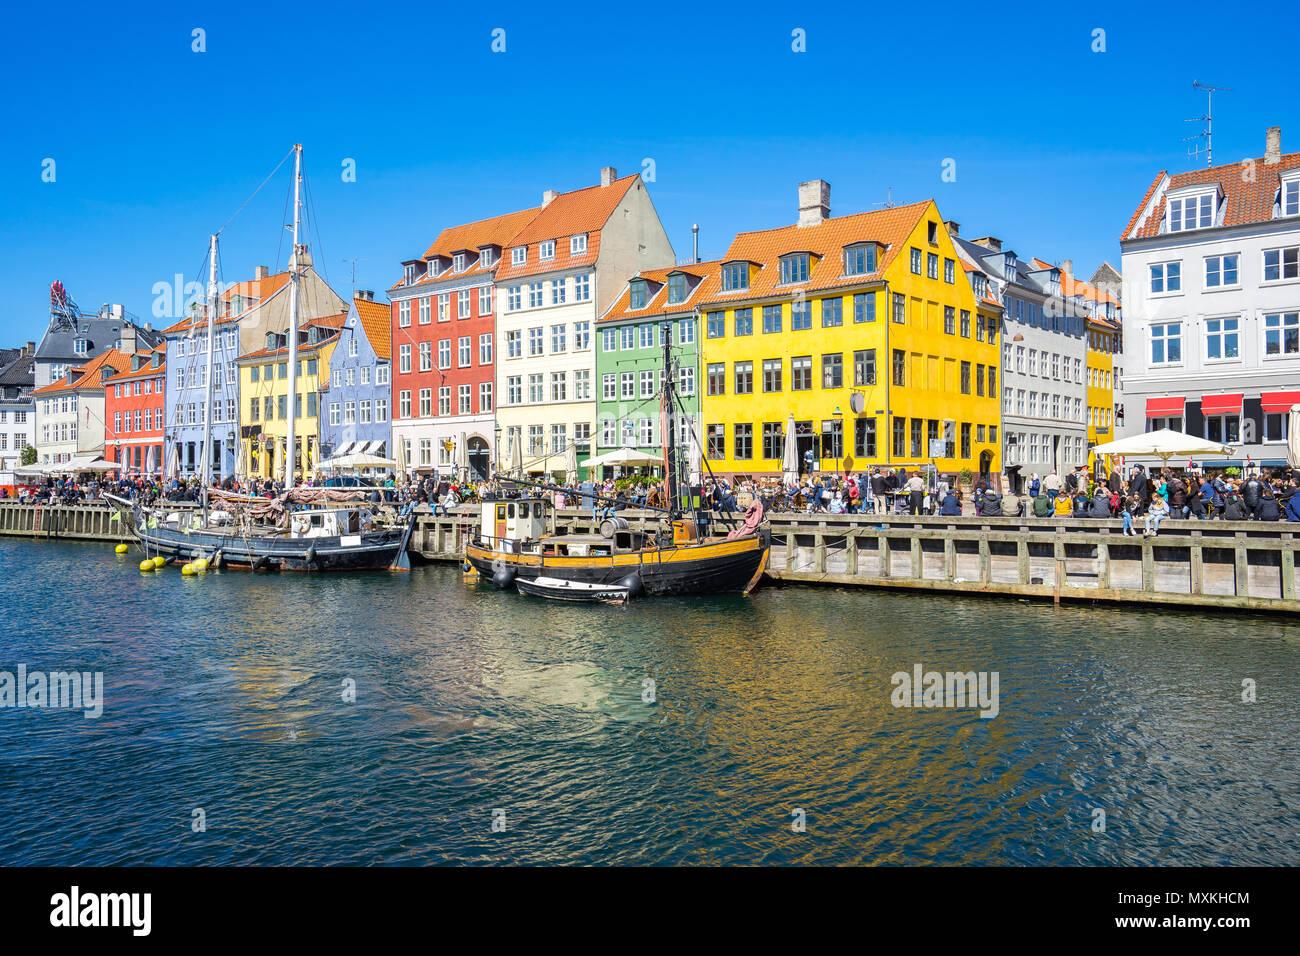 El Waterfront Canal Nyhavn en Copenhague, Dinamarca. Foto de stock